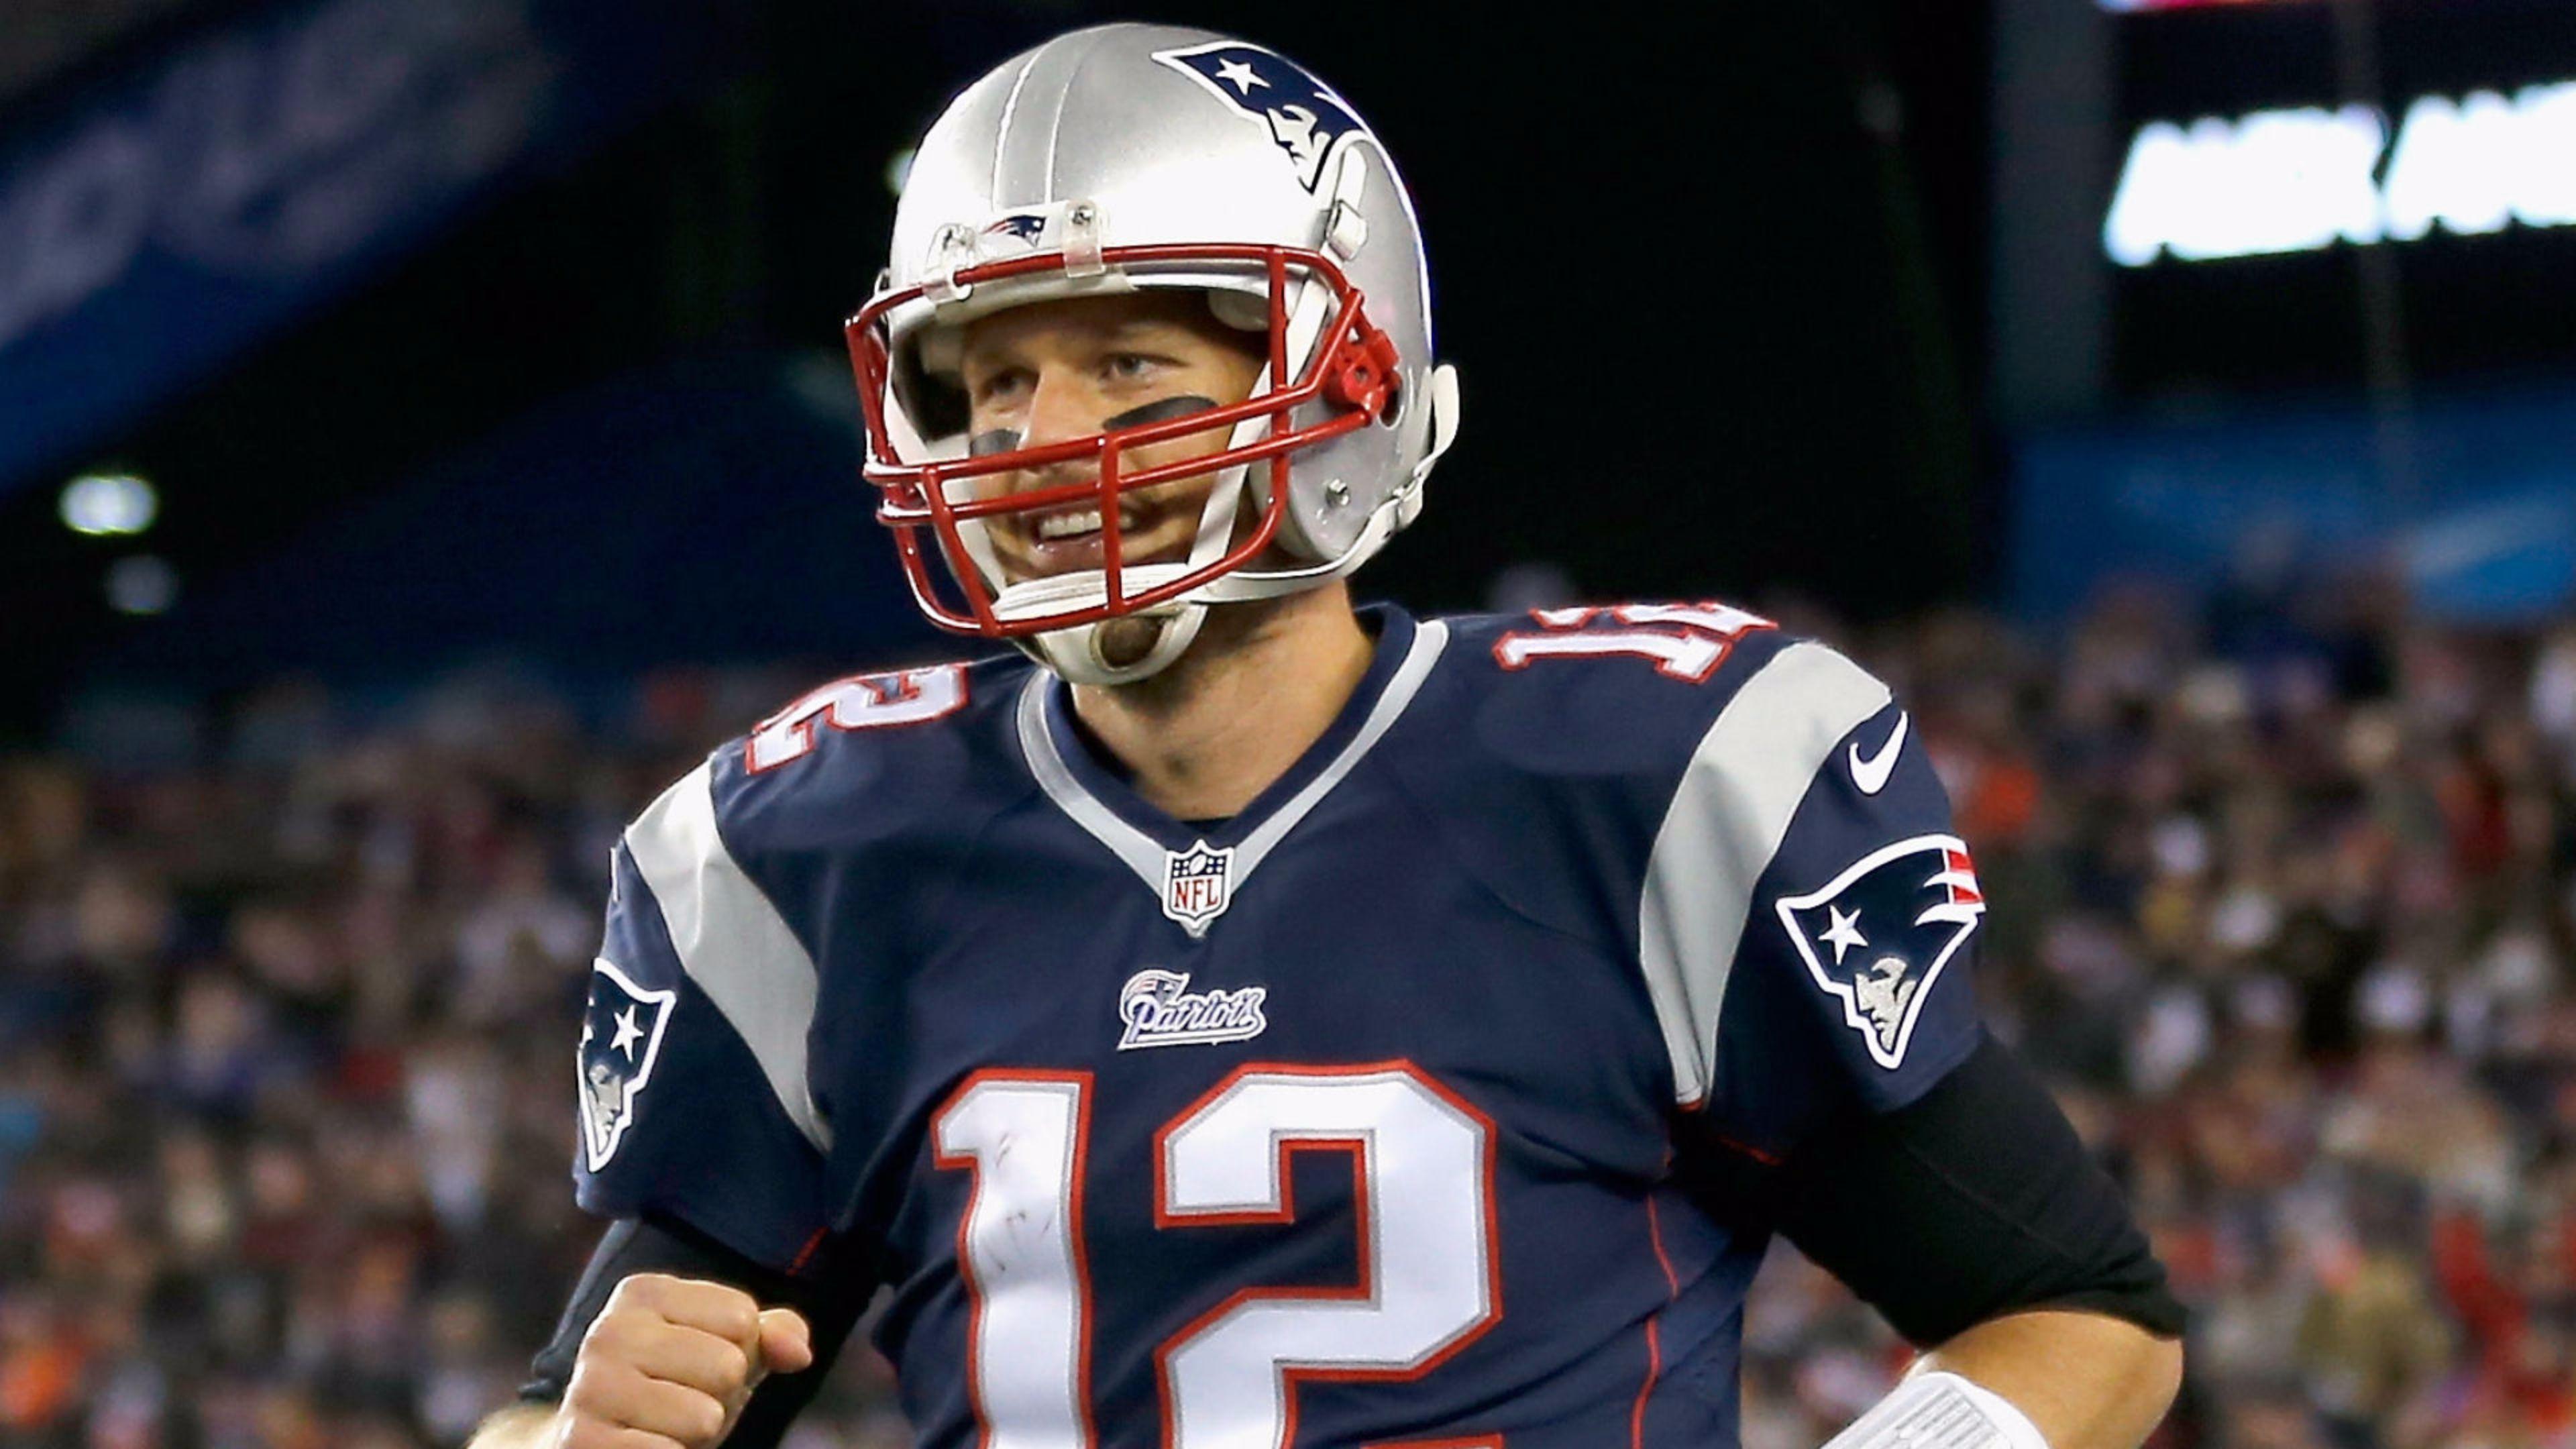 New England Patriots Tom Brady Wallpapers - Wallpaper Cave